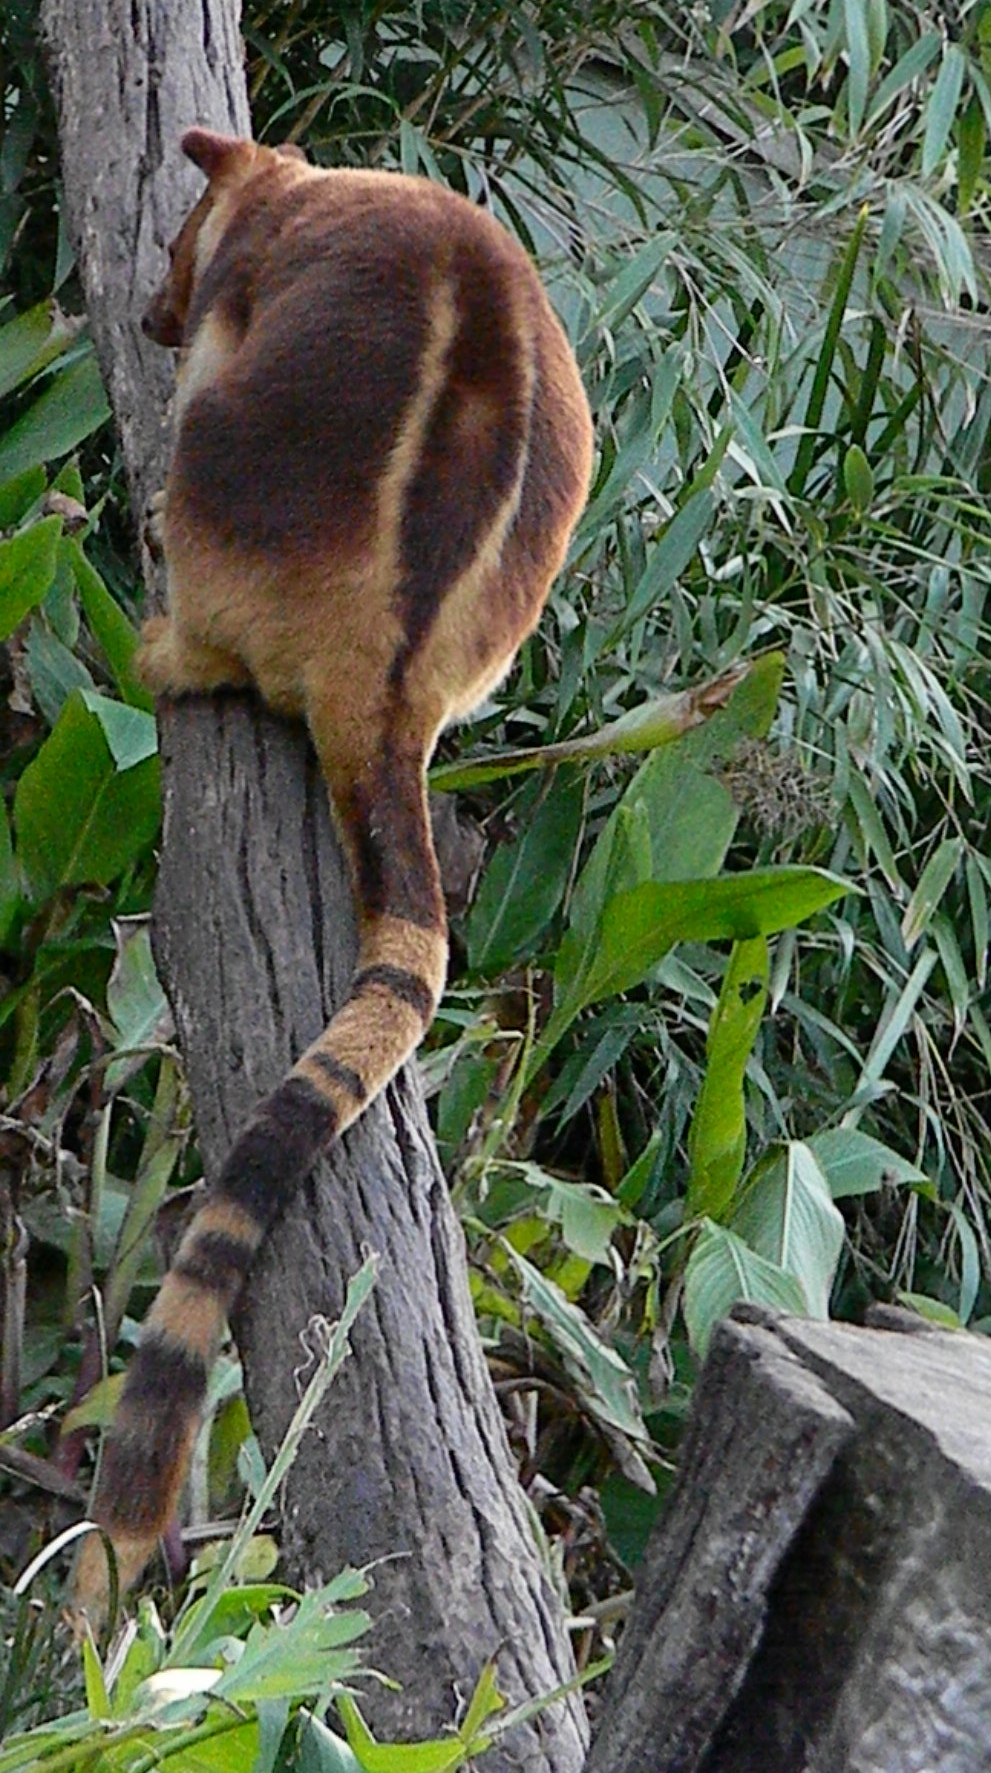 New-Guinea-wildlife-Goodfellow's-tree-kangaroo-Dendrolagus-godfellowi